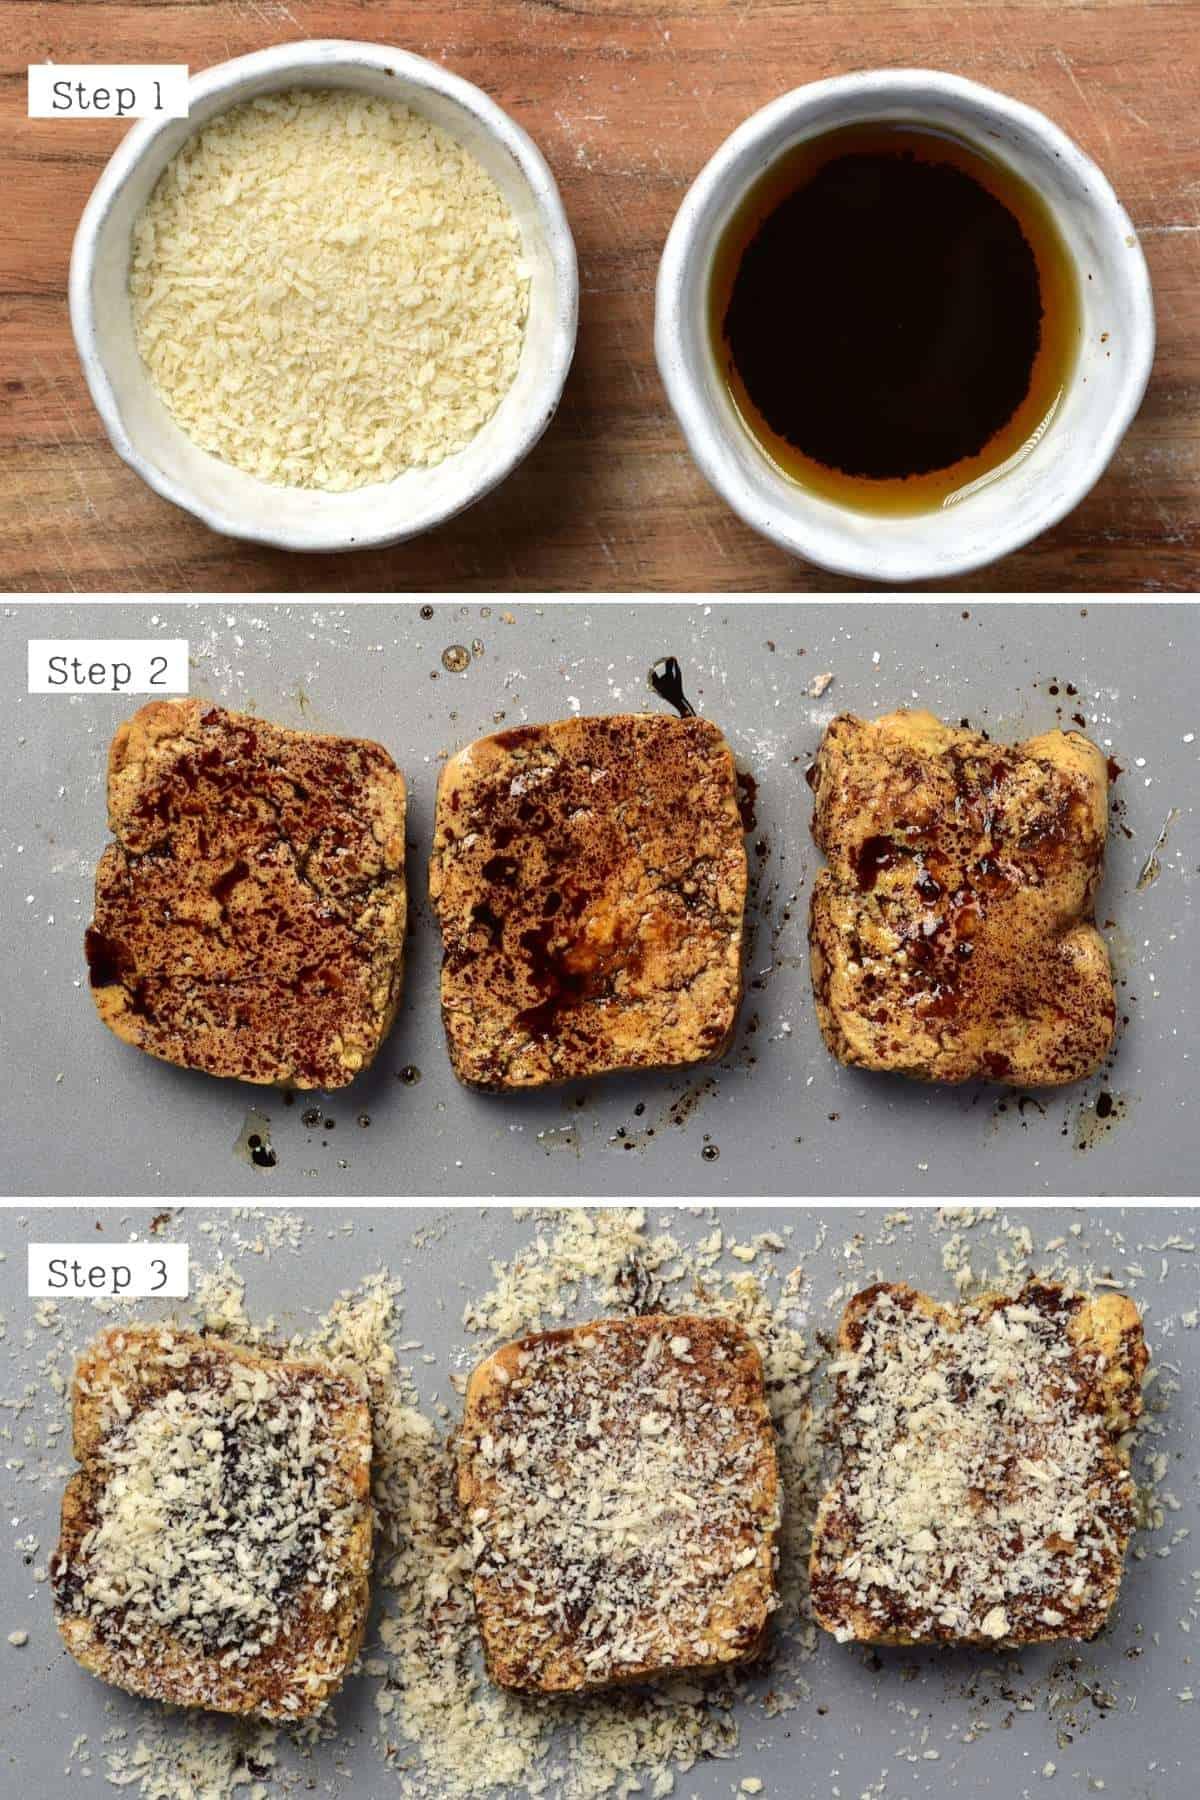 Steps for breading tofu